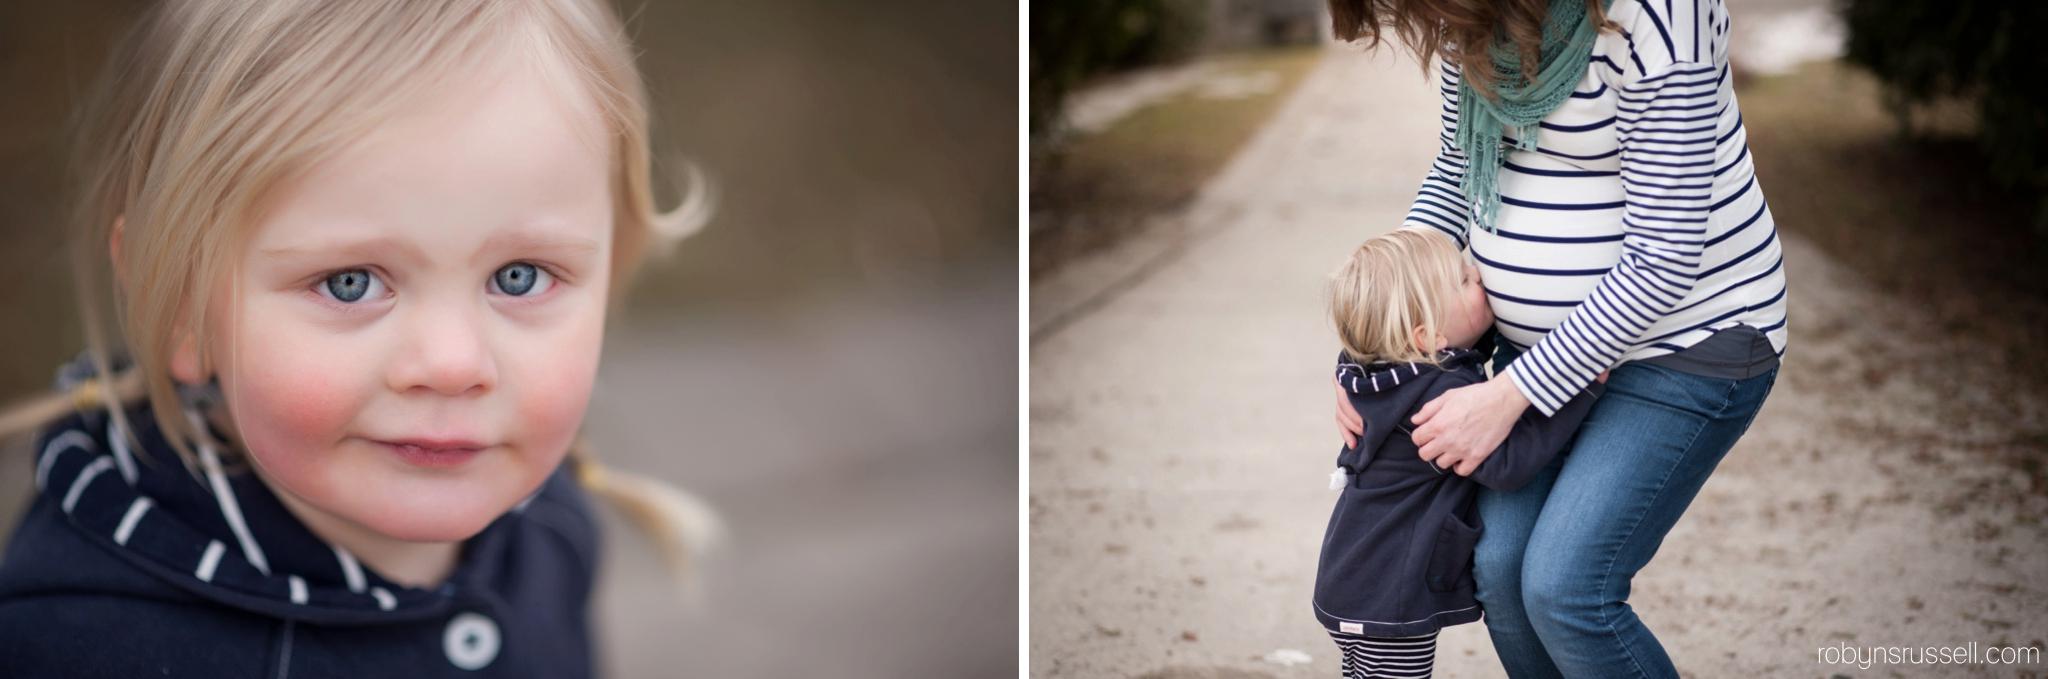 10-adorable-girl-kissing-pregnant-belly.jpg